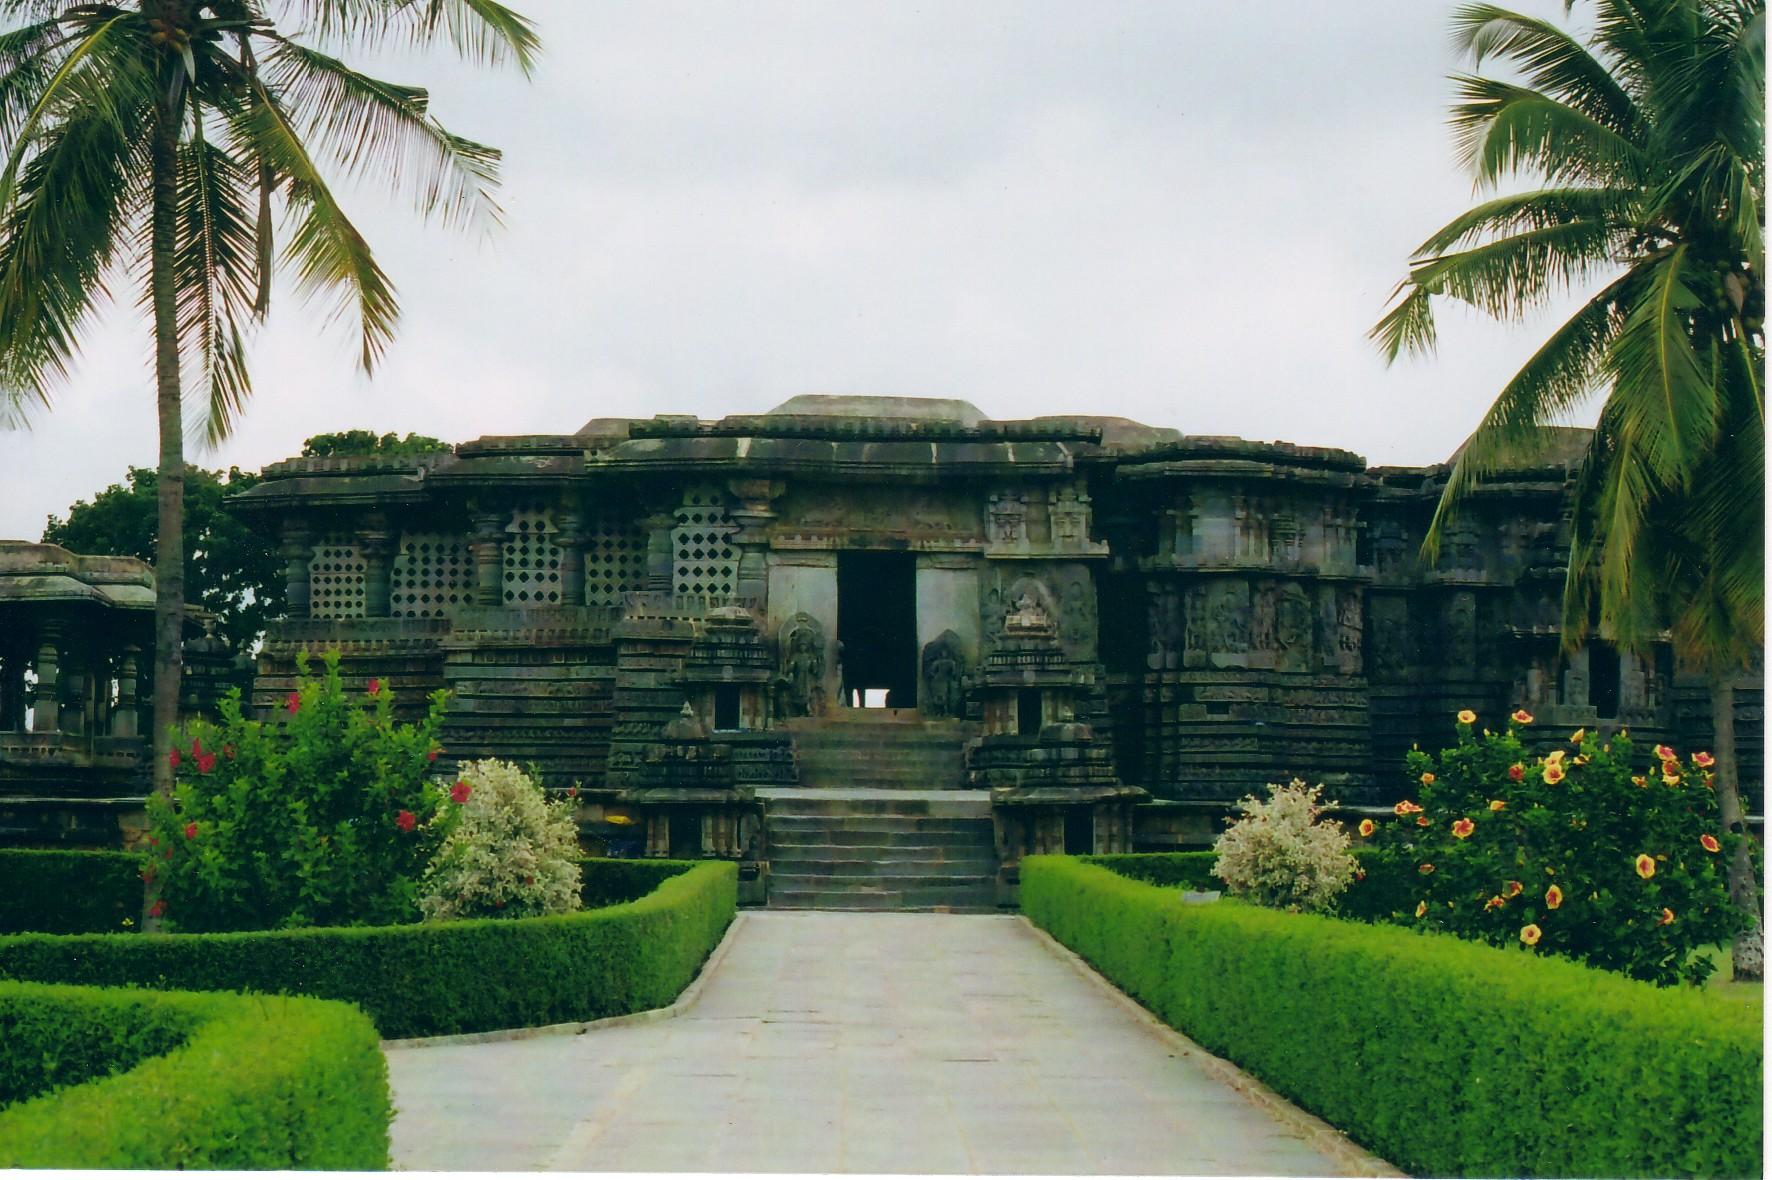 Belur Halebid Shravanabelagola Package Tour By Kstdc